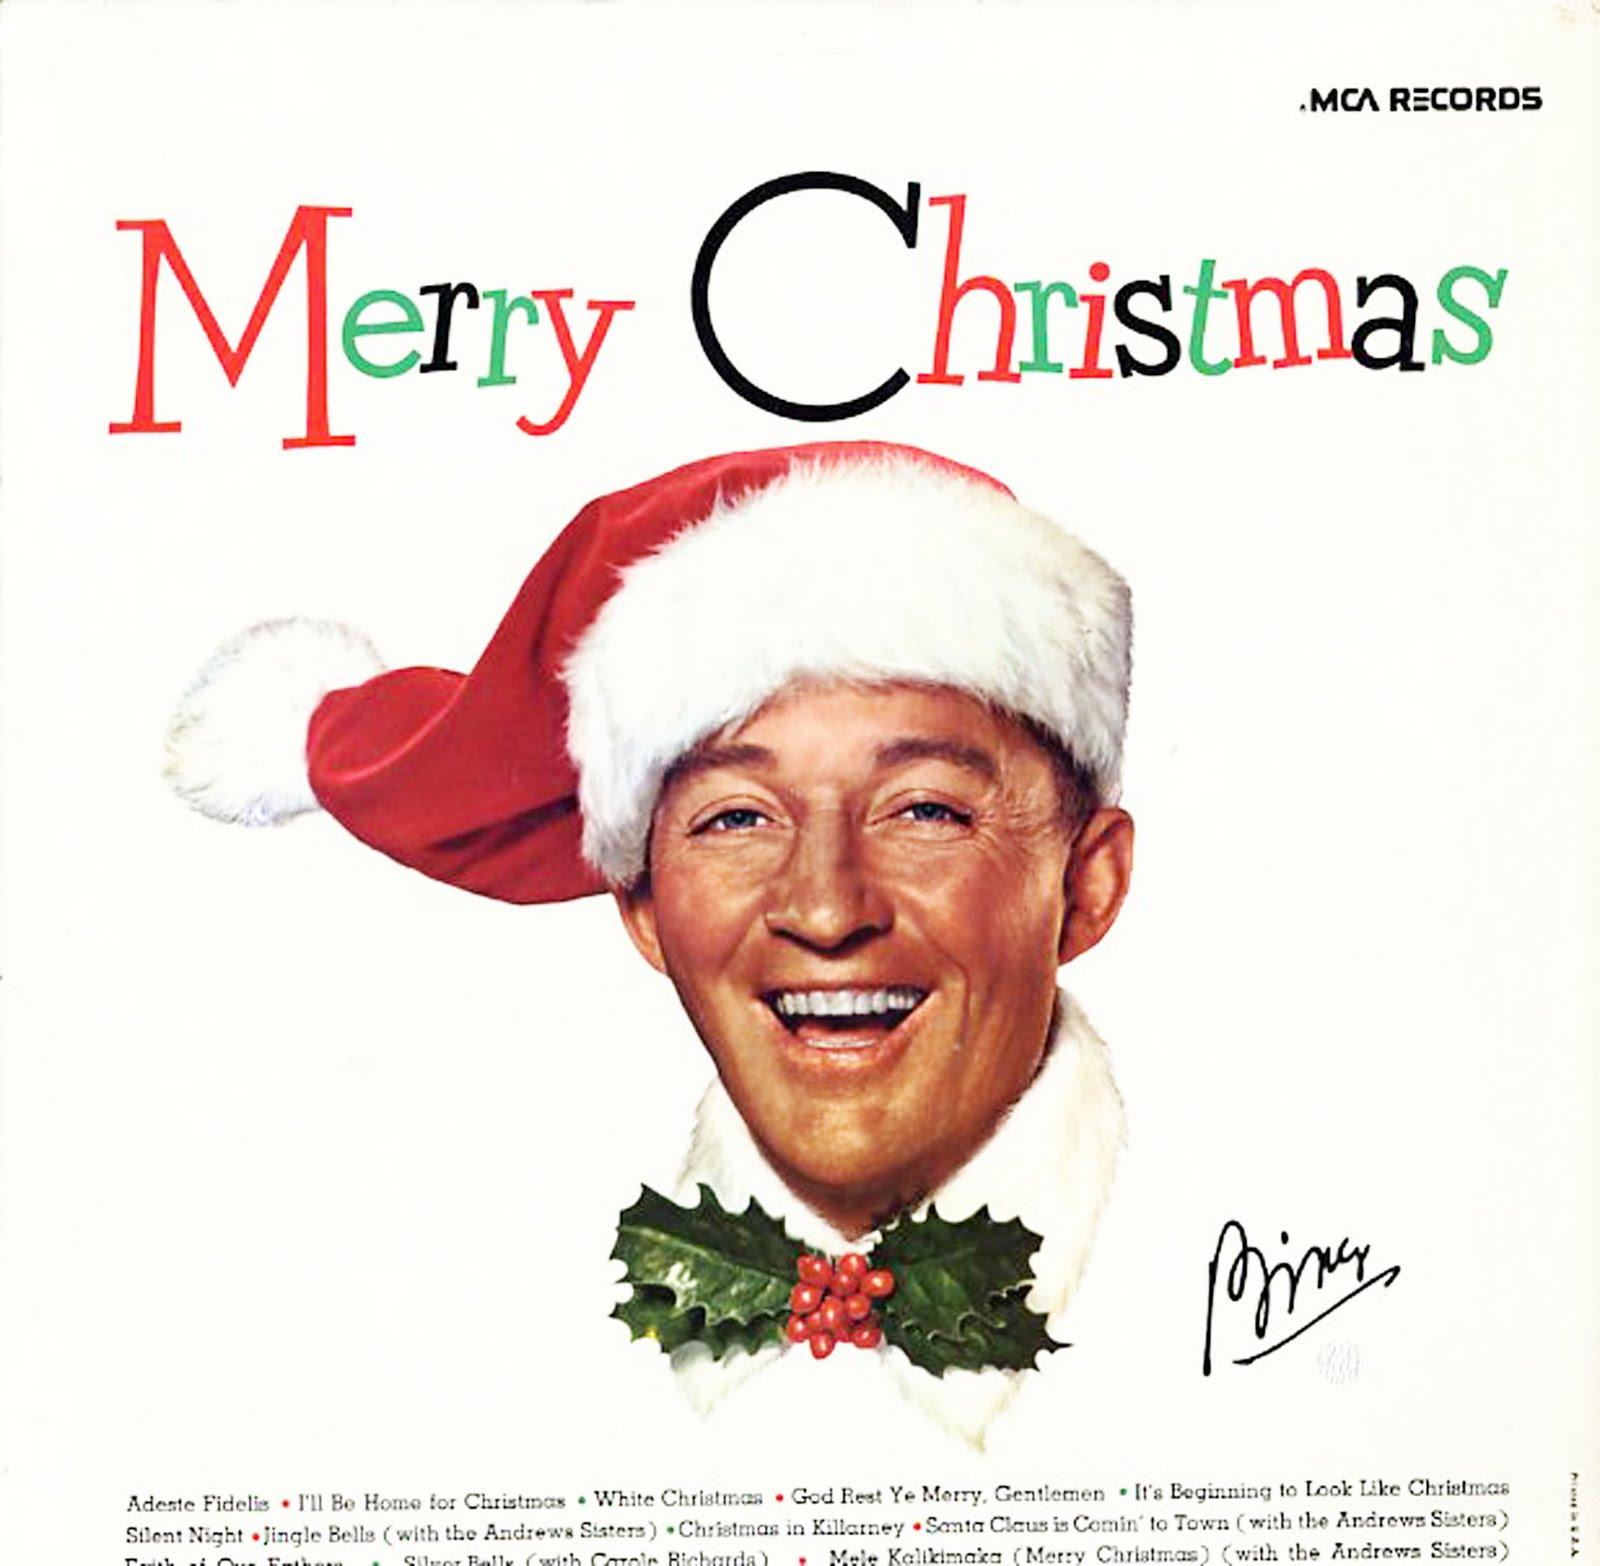 merry christmas bing crosby 1955